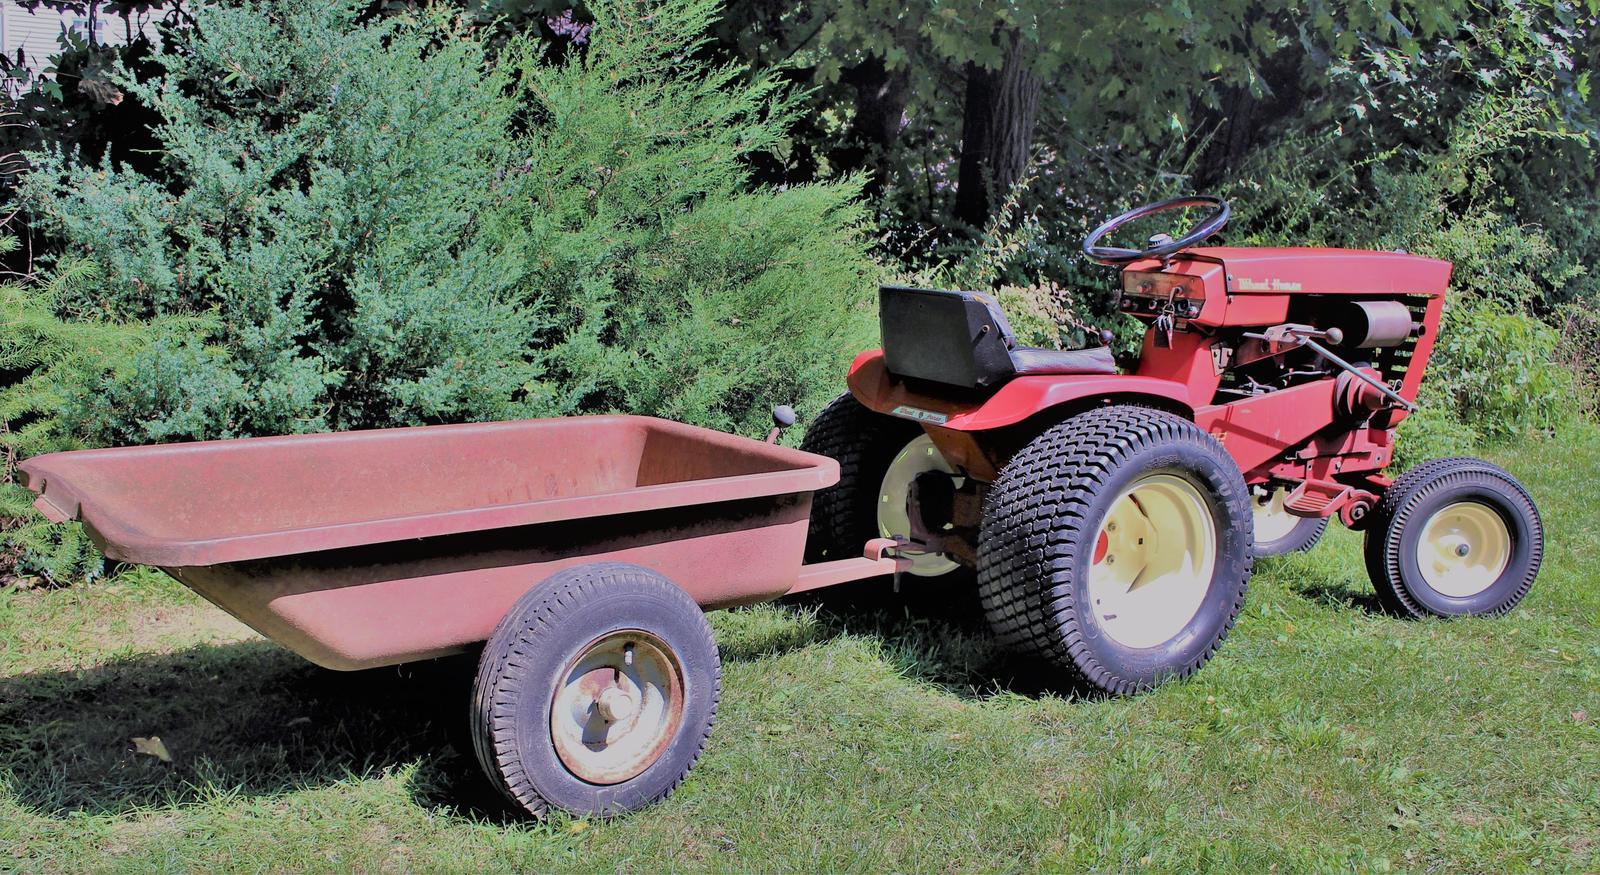 '66 Model 1056-2